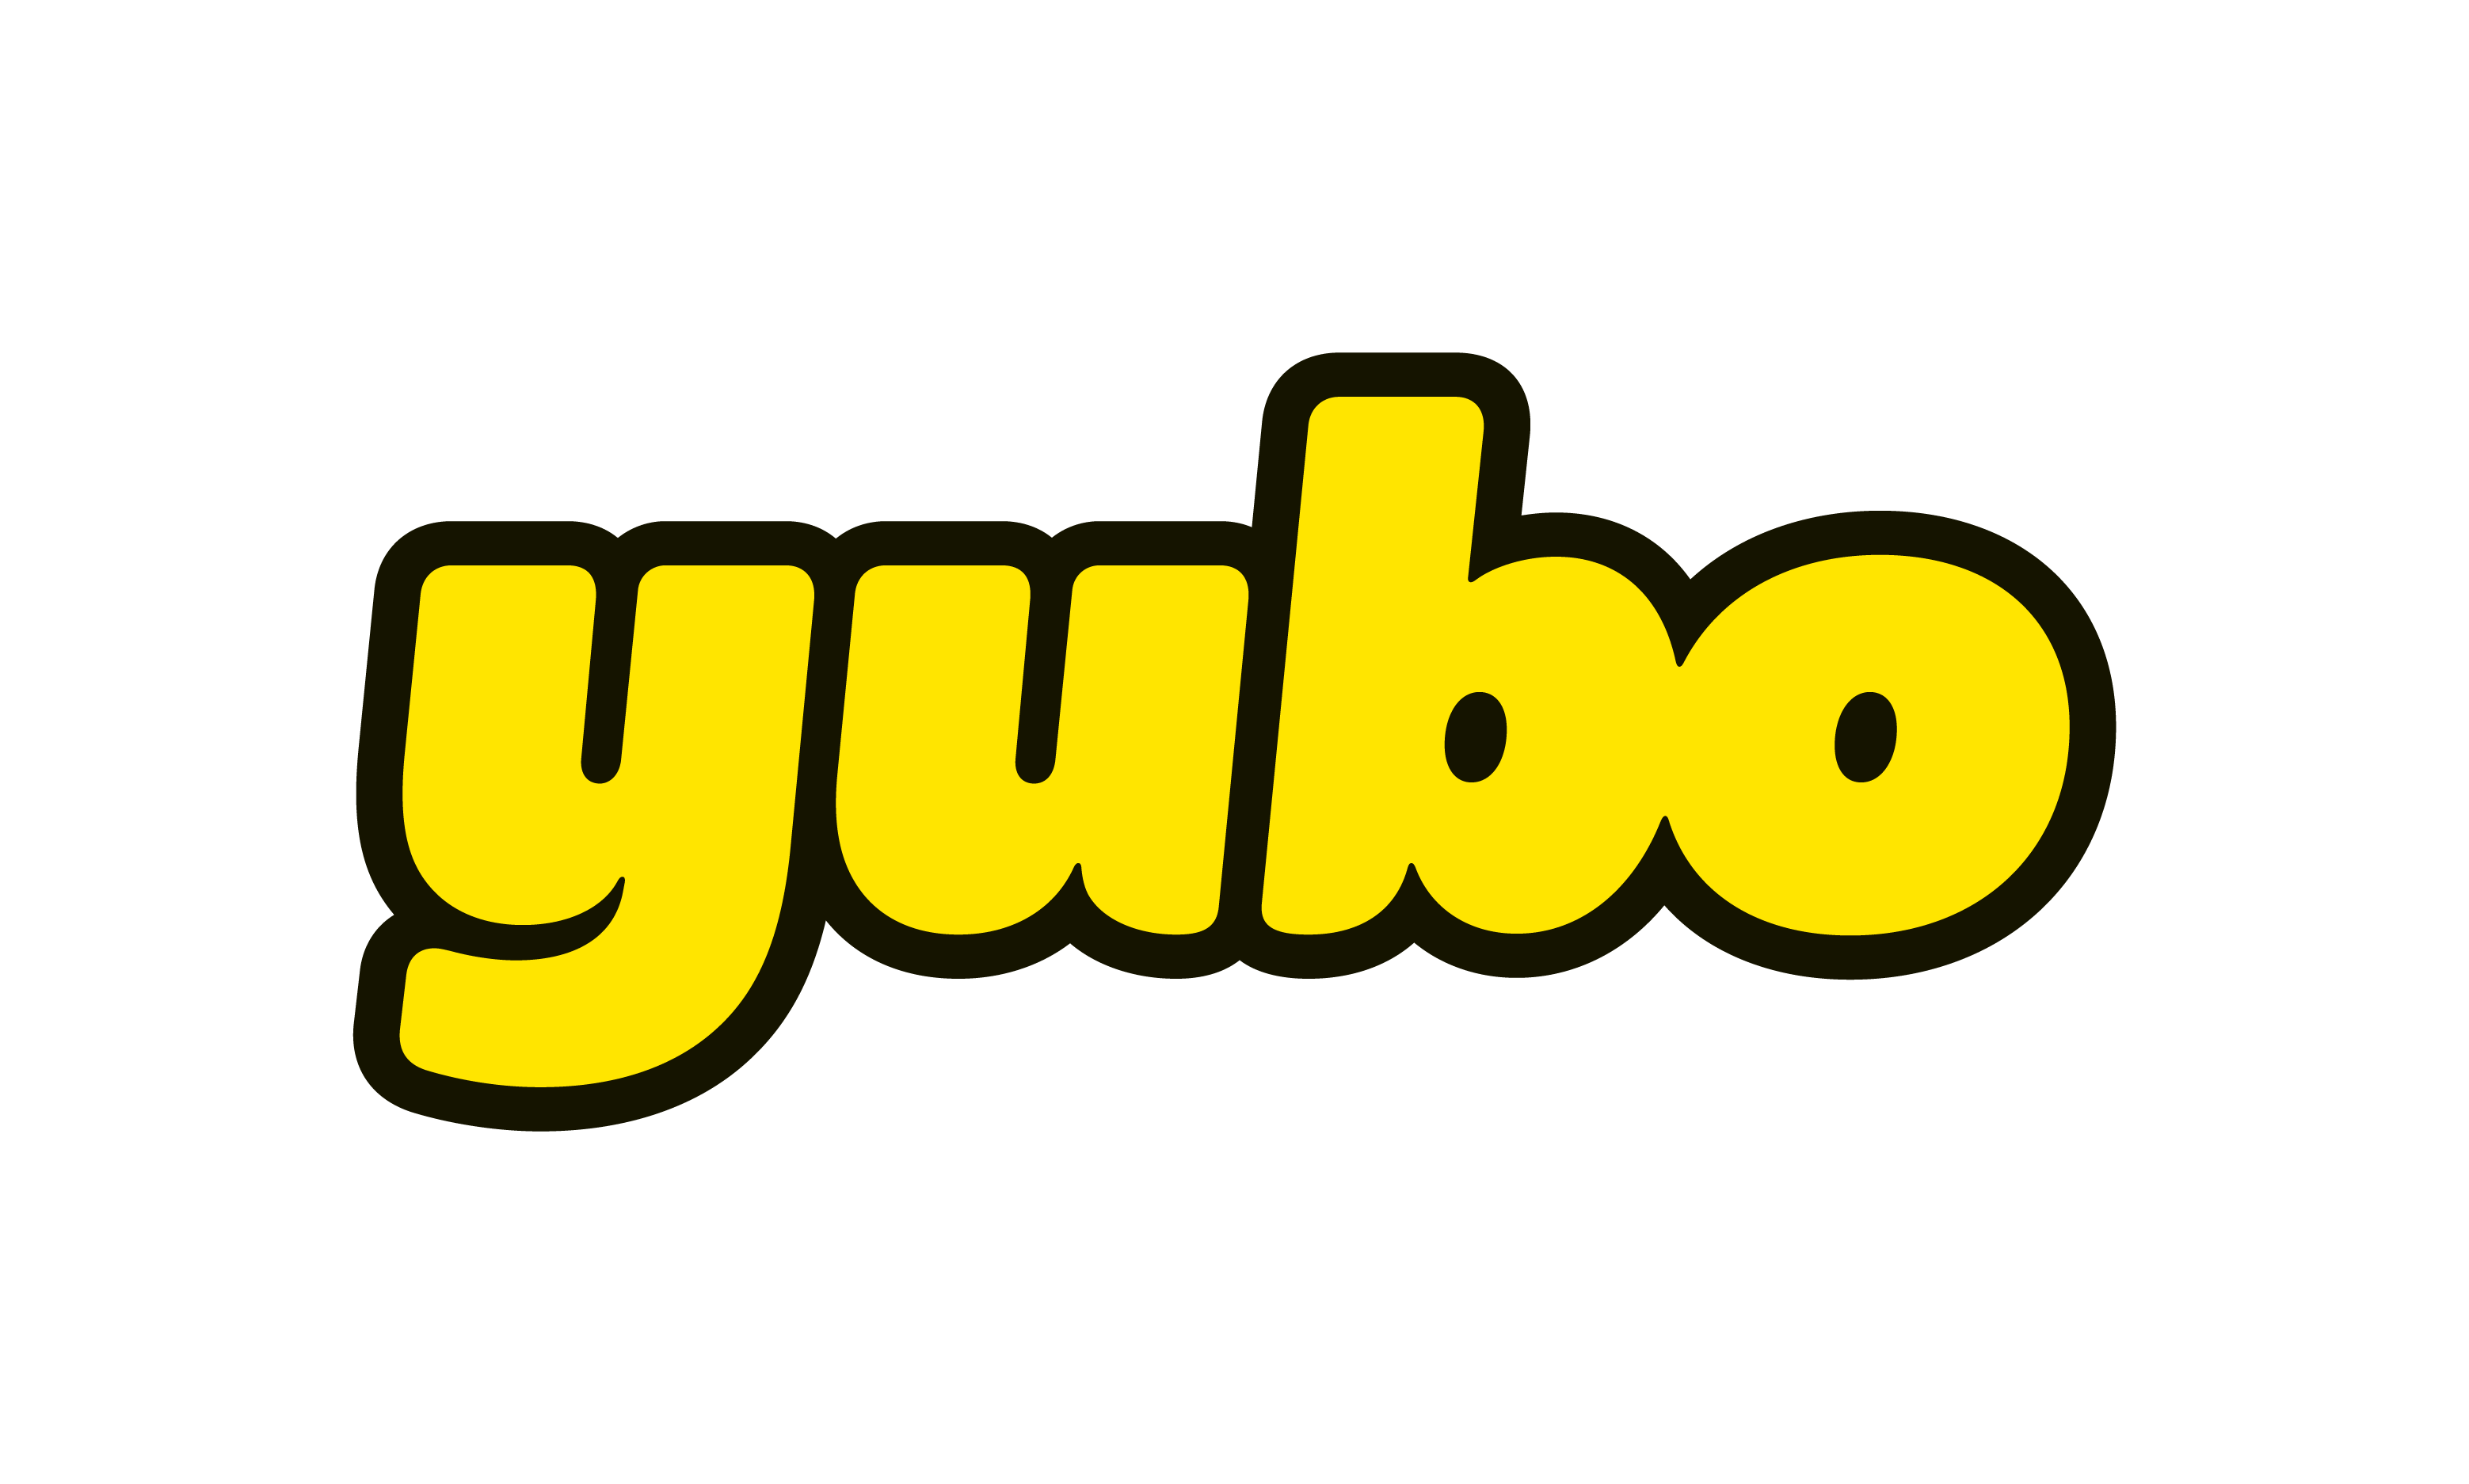 Yubo_logo